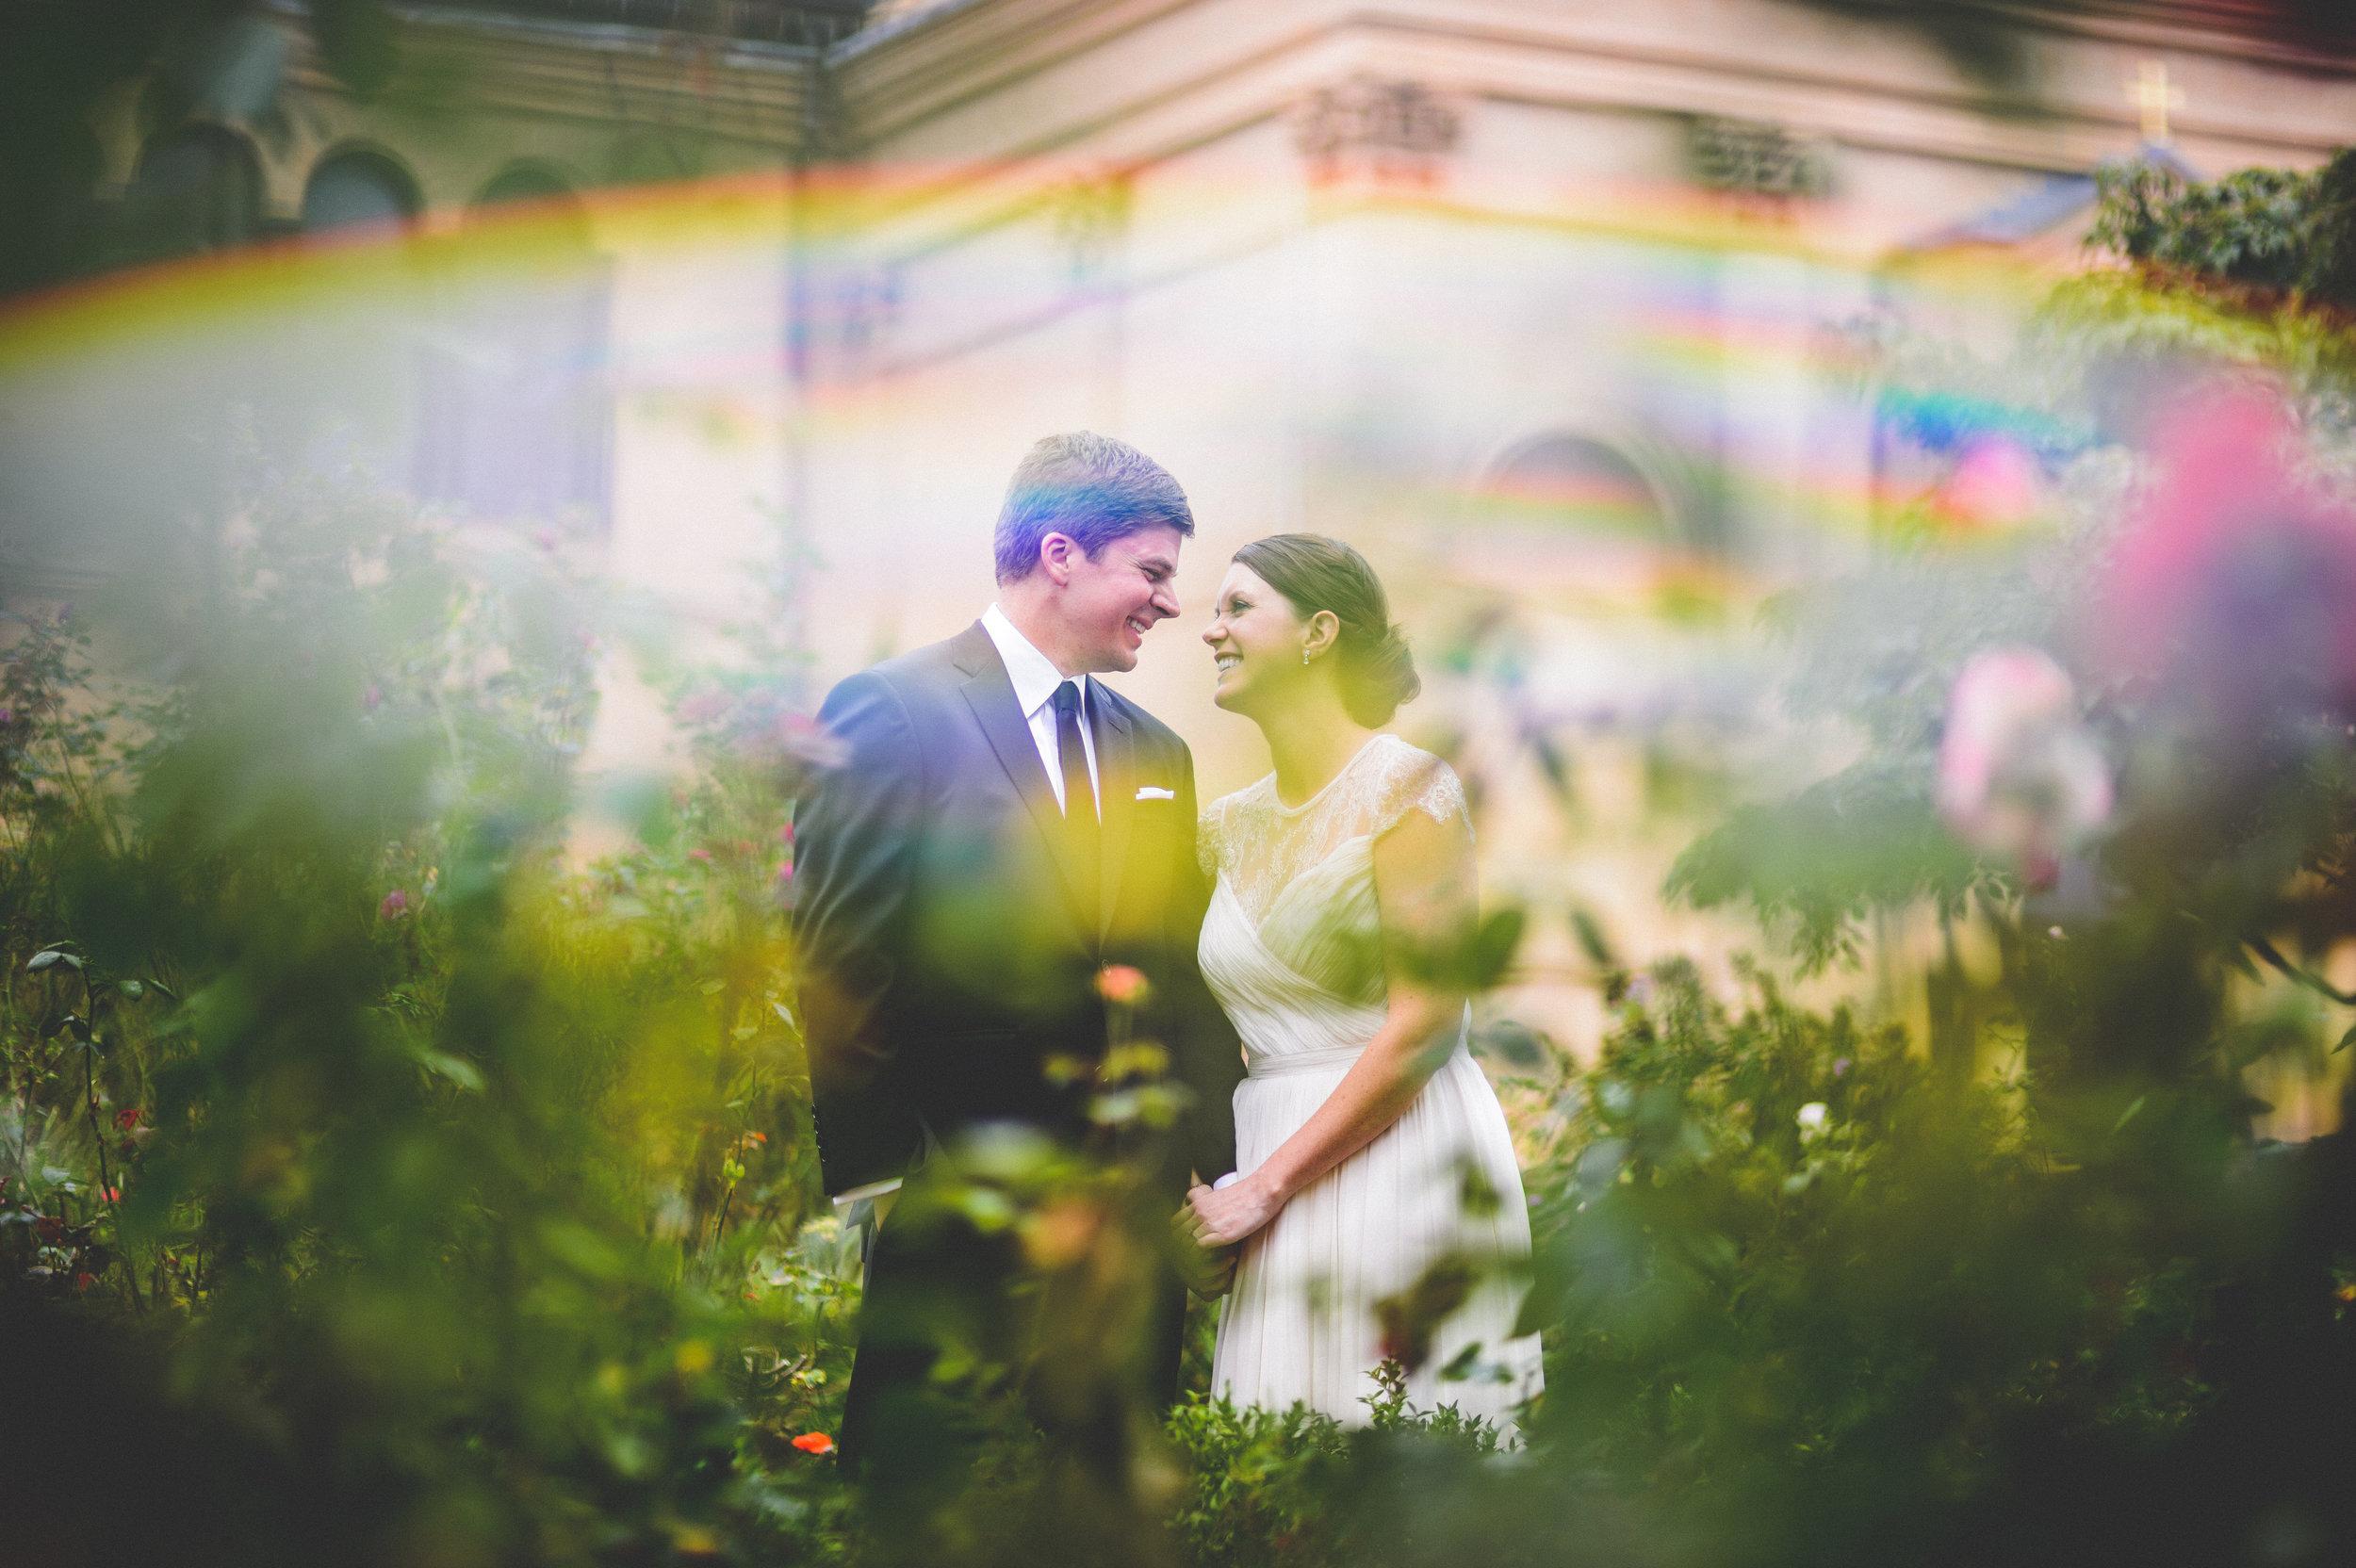 Katie and Ryan wedding franciscan monastery washington dc wedding photographer nathan mitchell-64.jpg